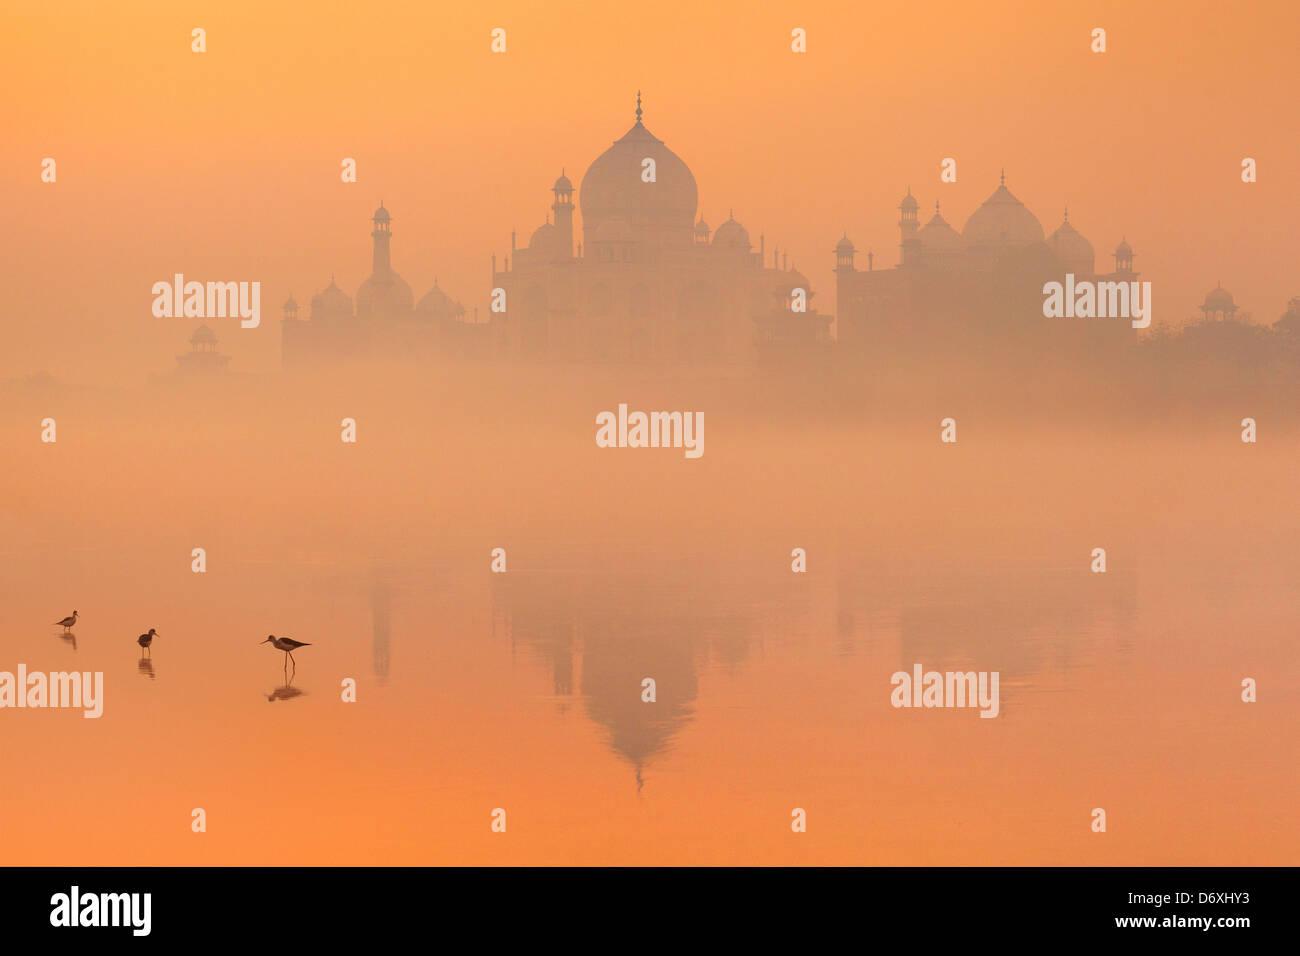 Skyline de Taj Mahal, Agra, Uttar Pradesh, Inde Banque D'Images